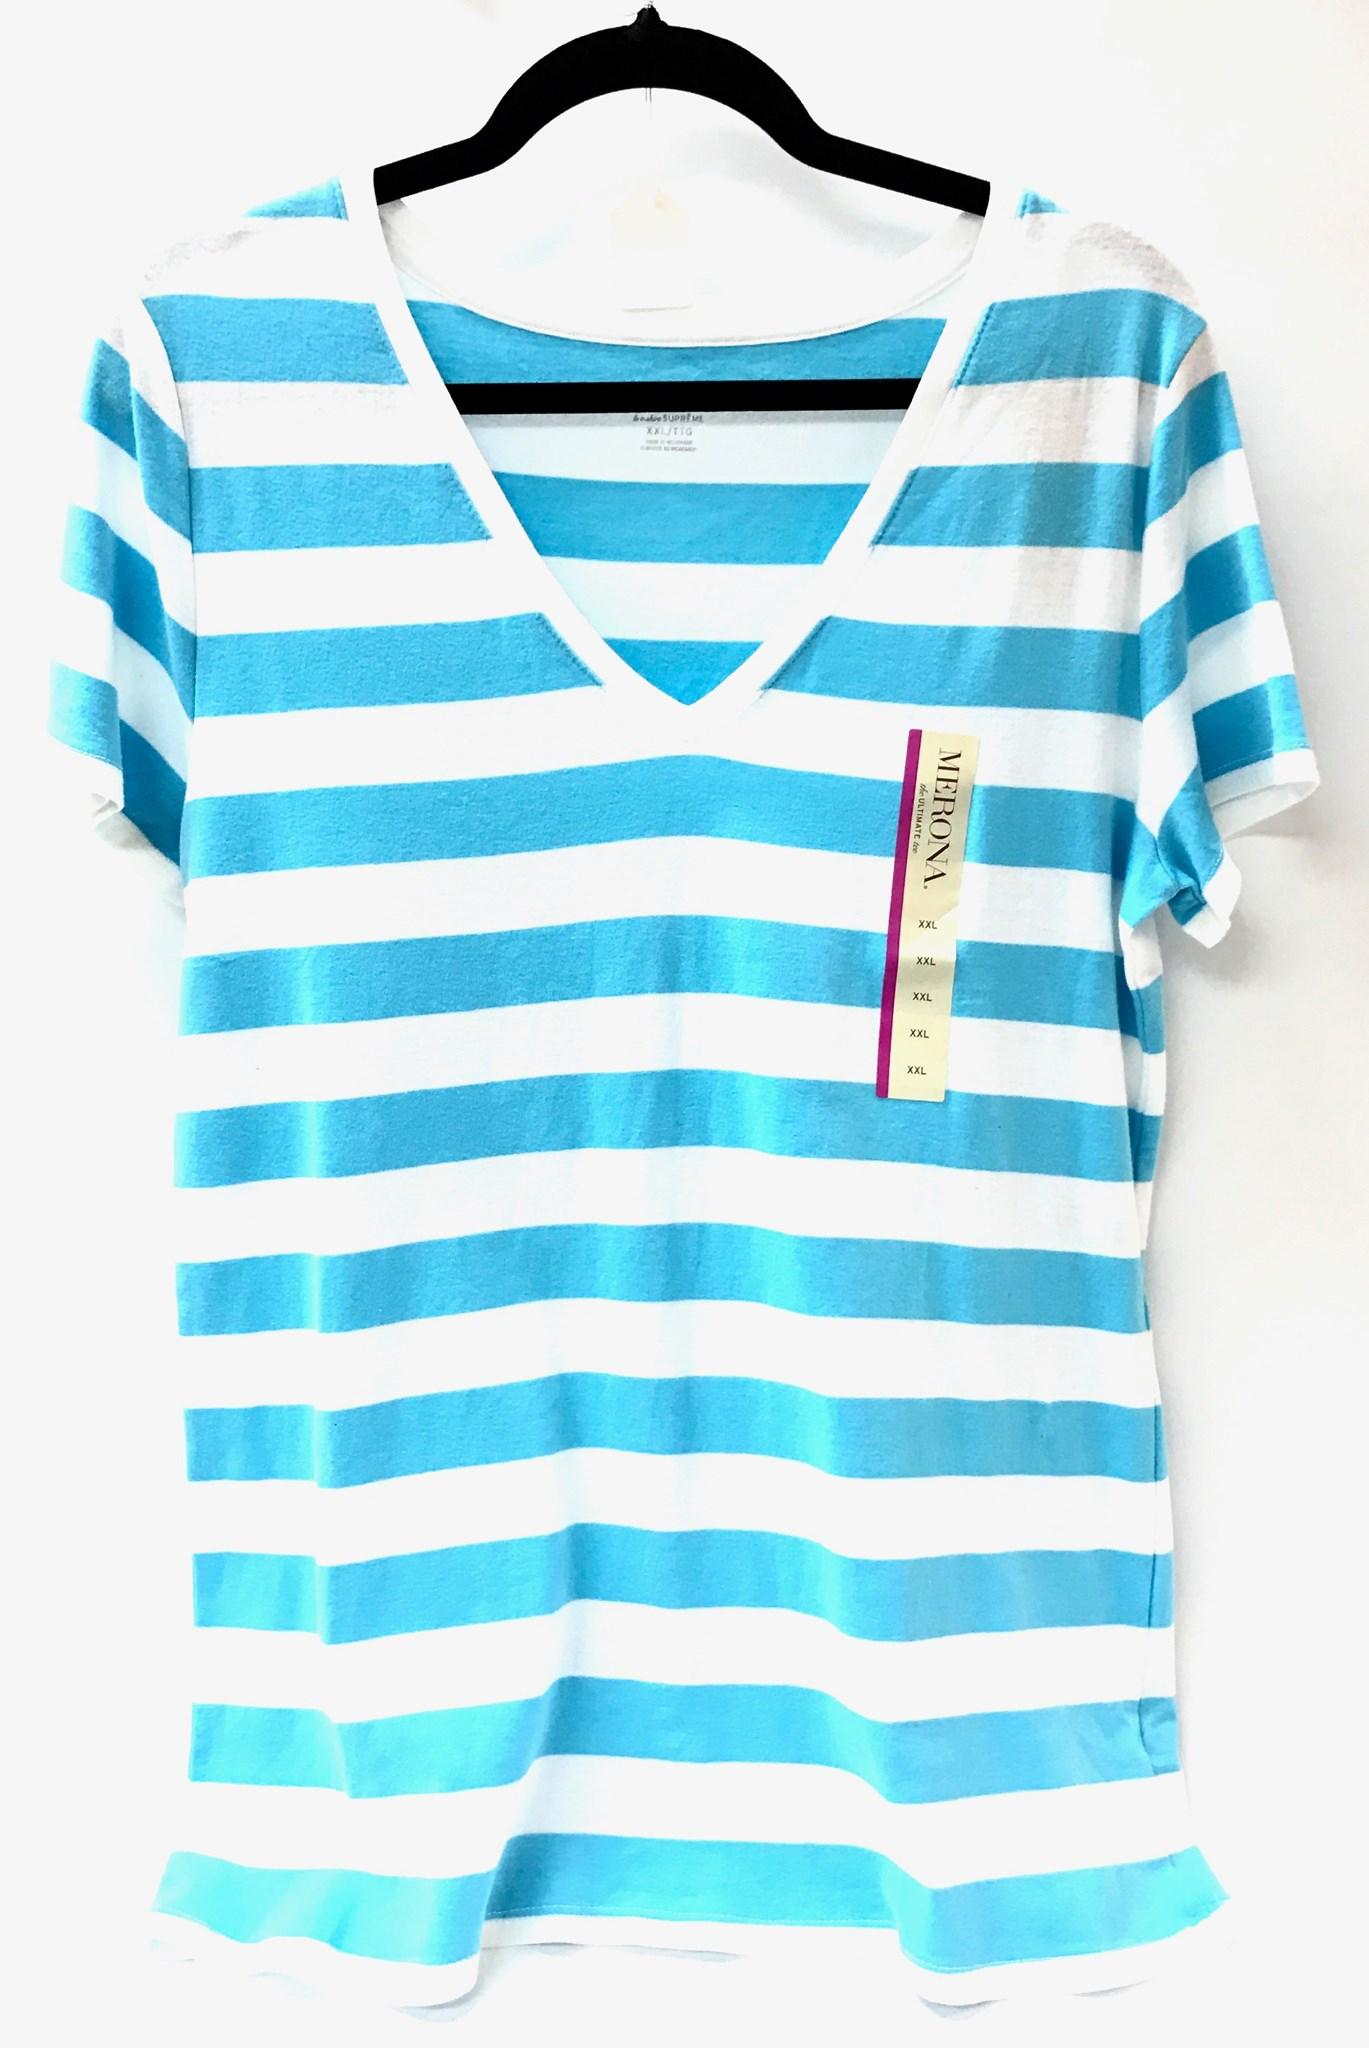 Blue/White Strip Shirt Size Large